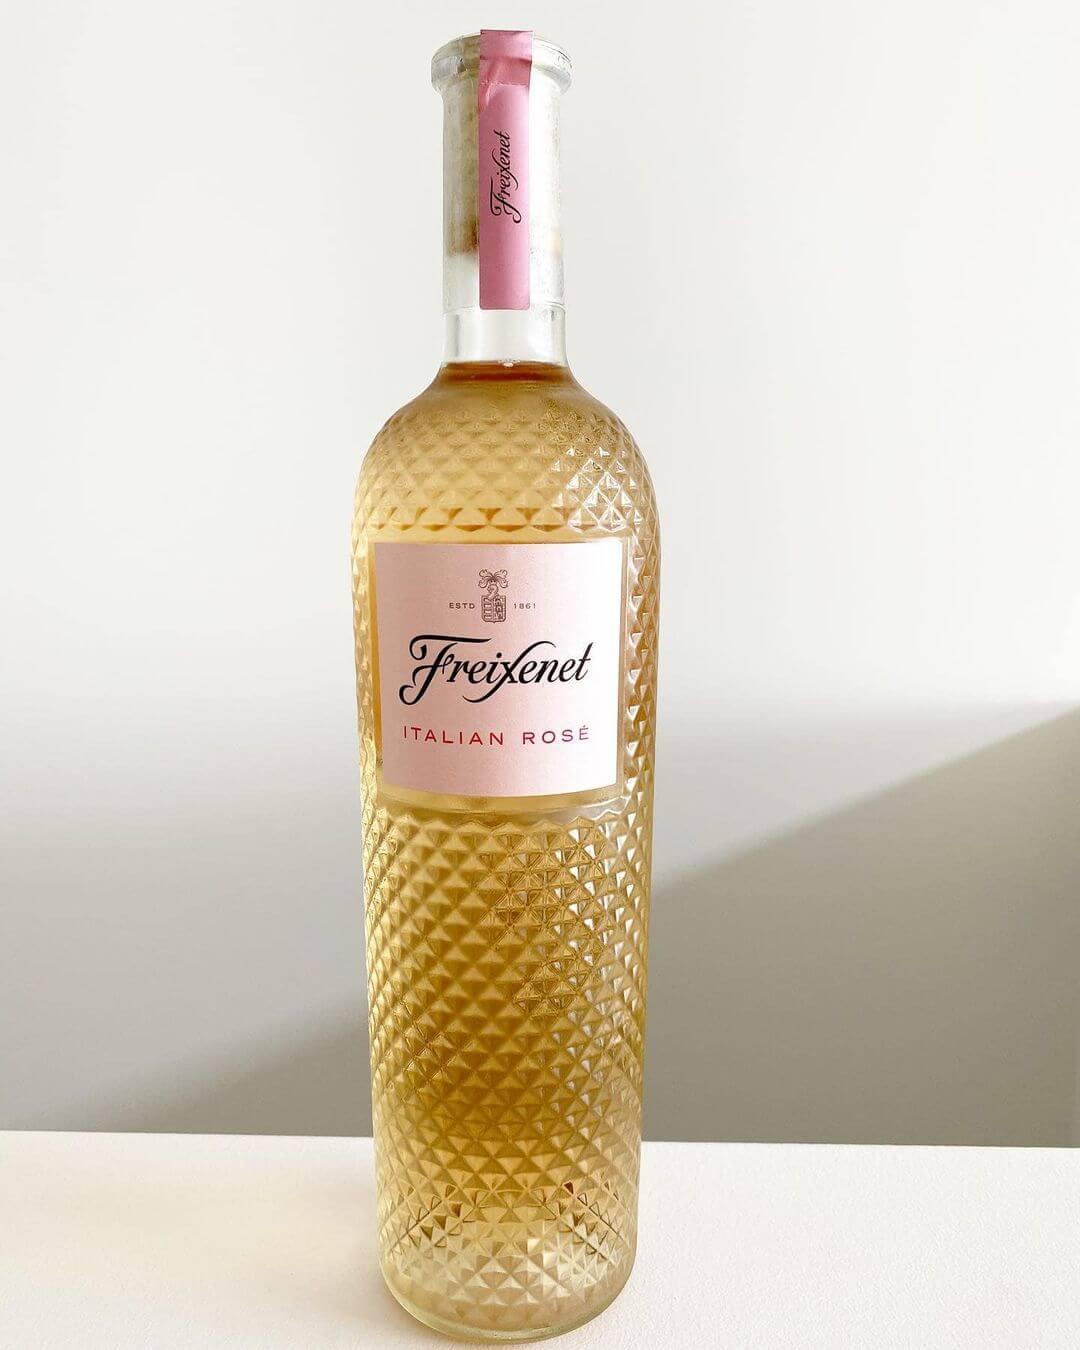 Freixenet Italian Rose – Tasting Note